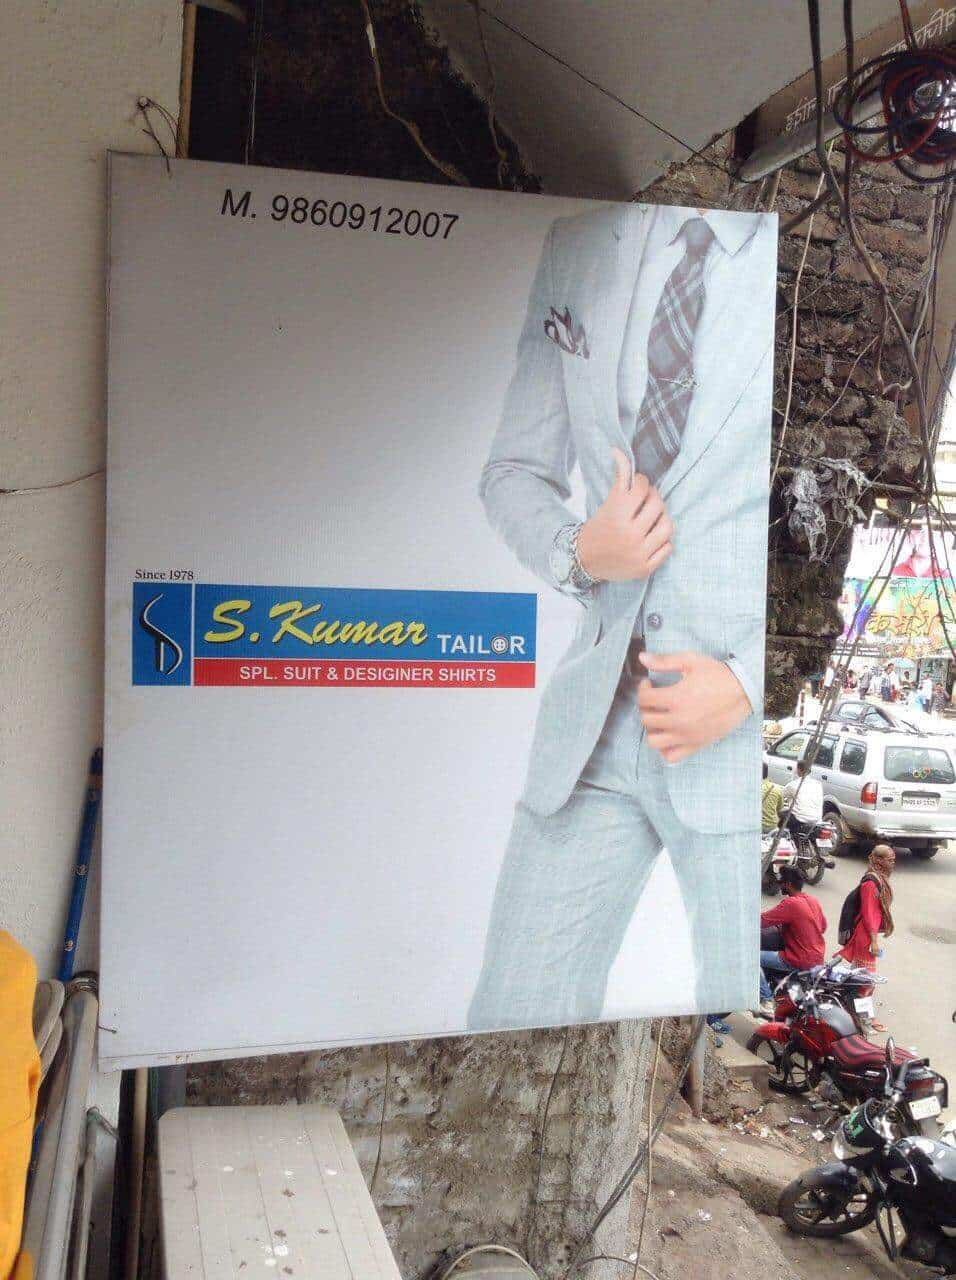 S.kumar Tailor, Vazirabad - Tailors in Nanded - Justdial